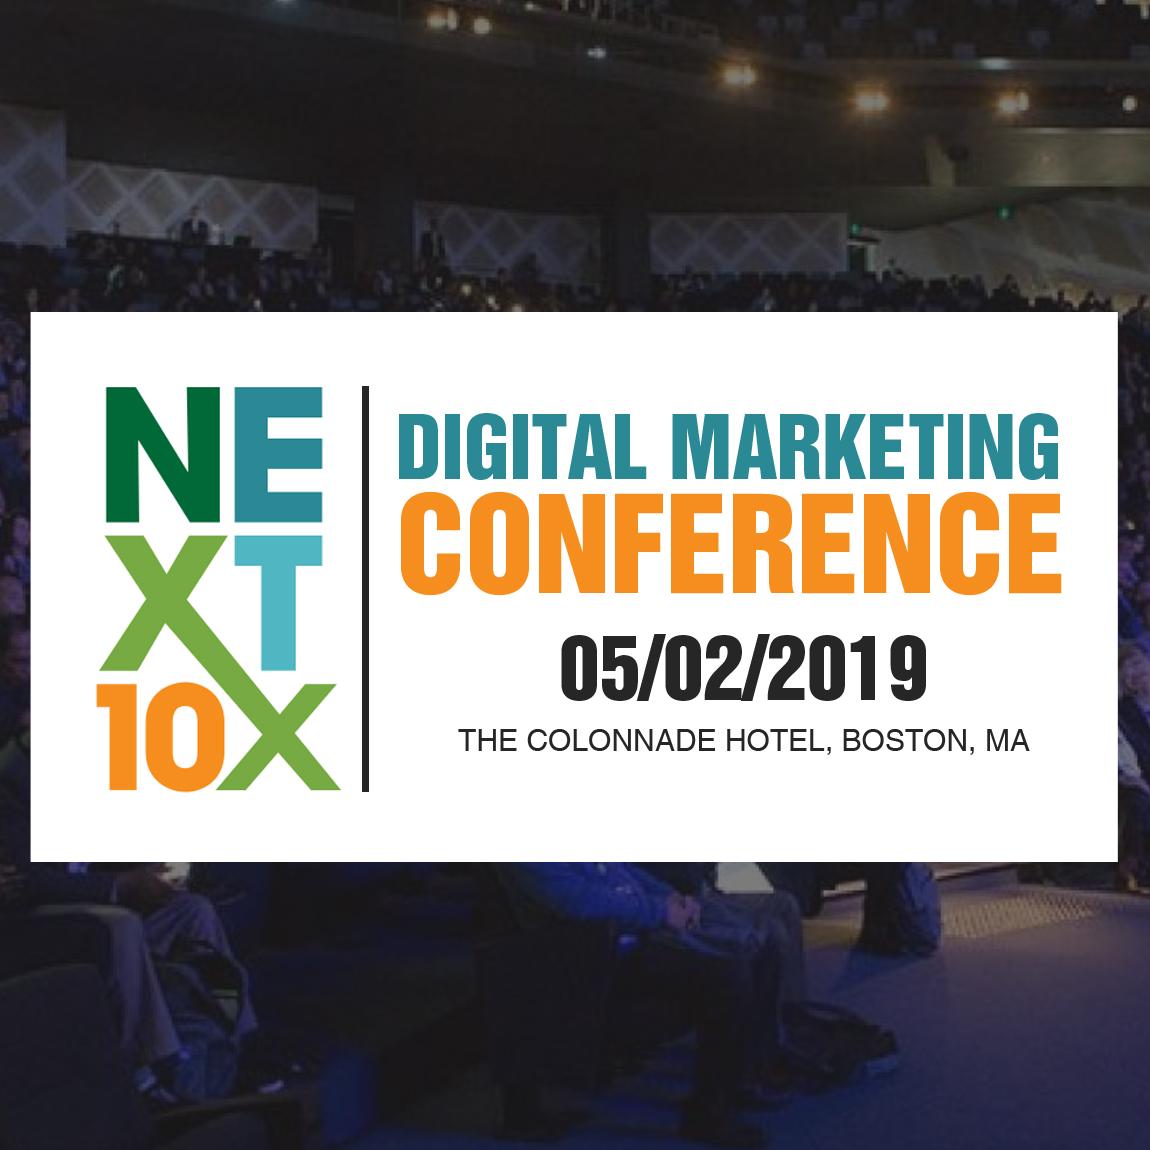 Next10x Digital Marketing Conference